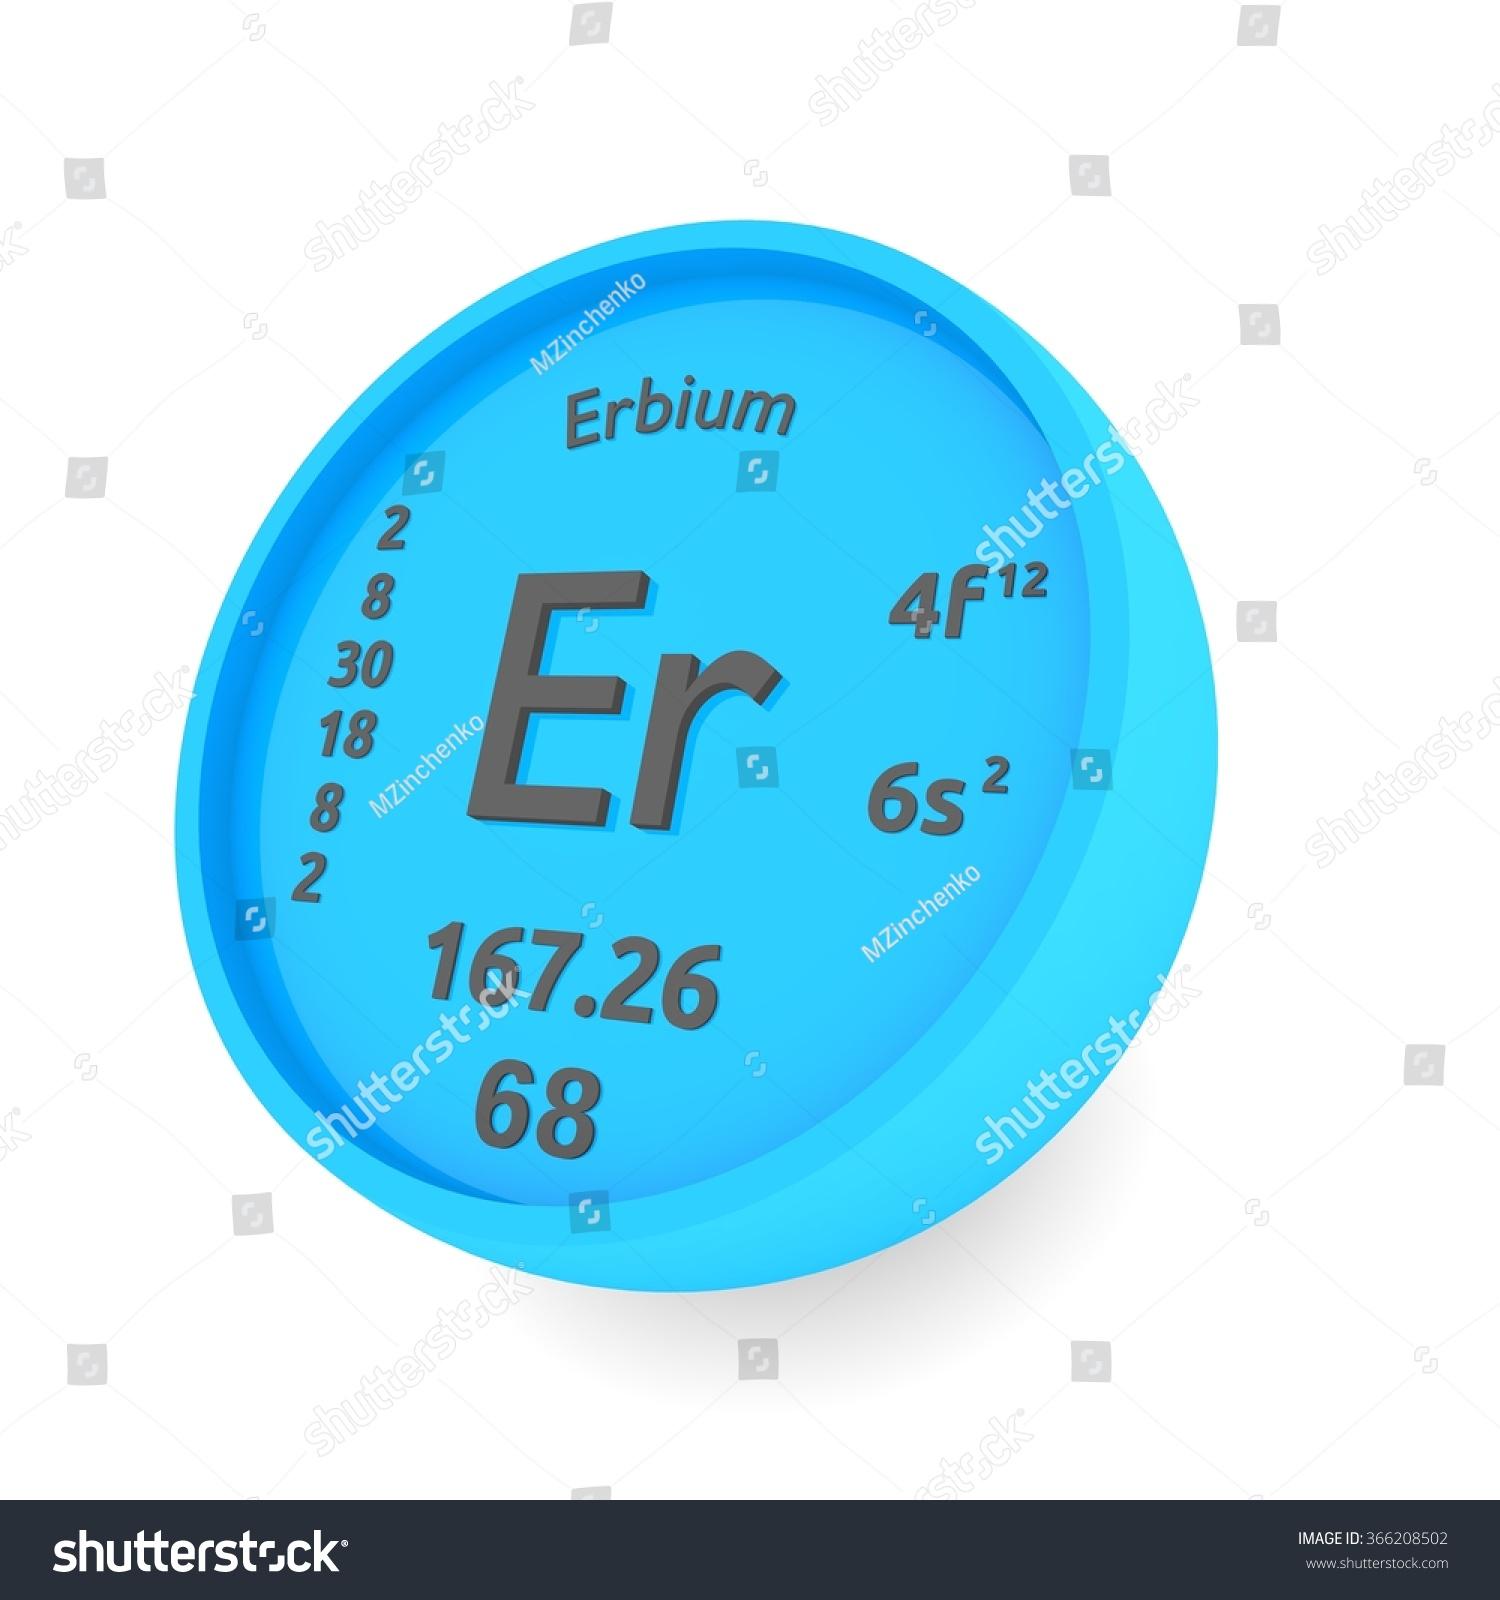 Erbium Chemical Element Sign Stock Illustration 366208502 Shutterstock